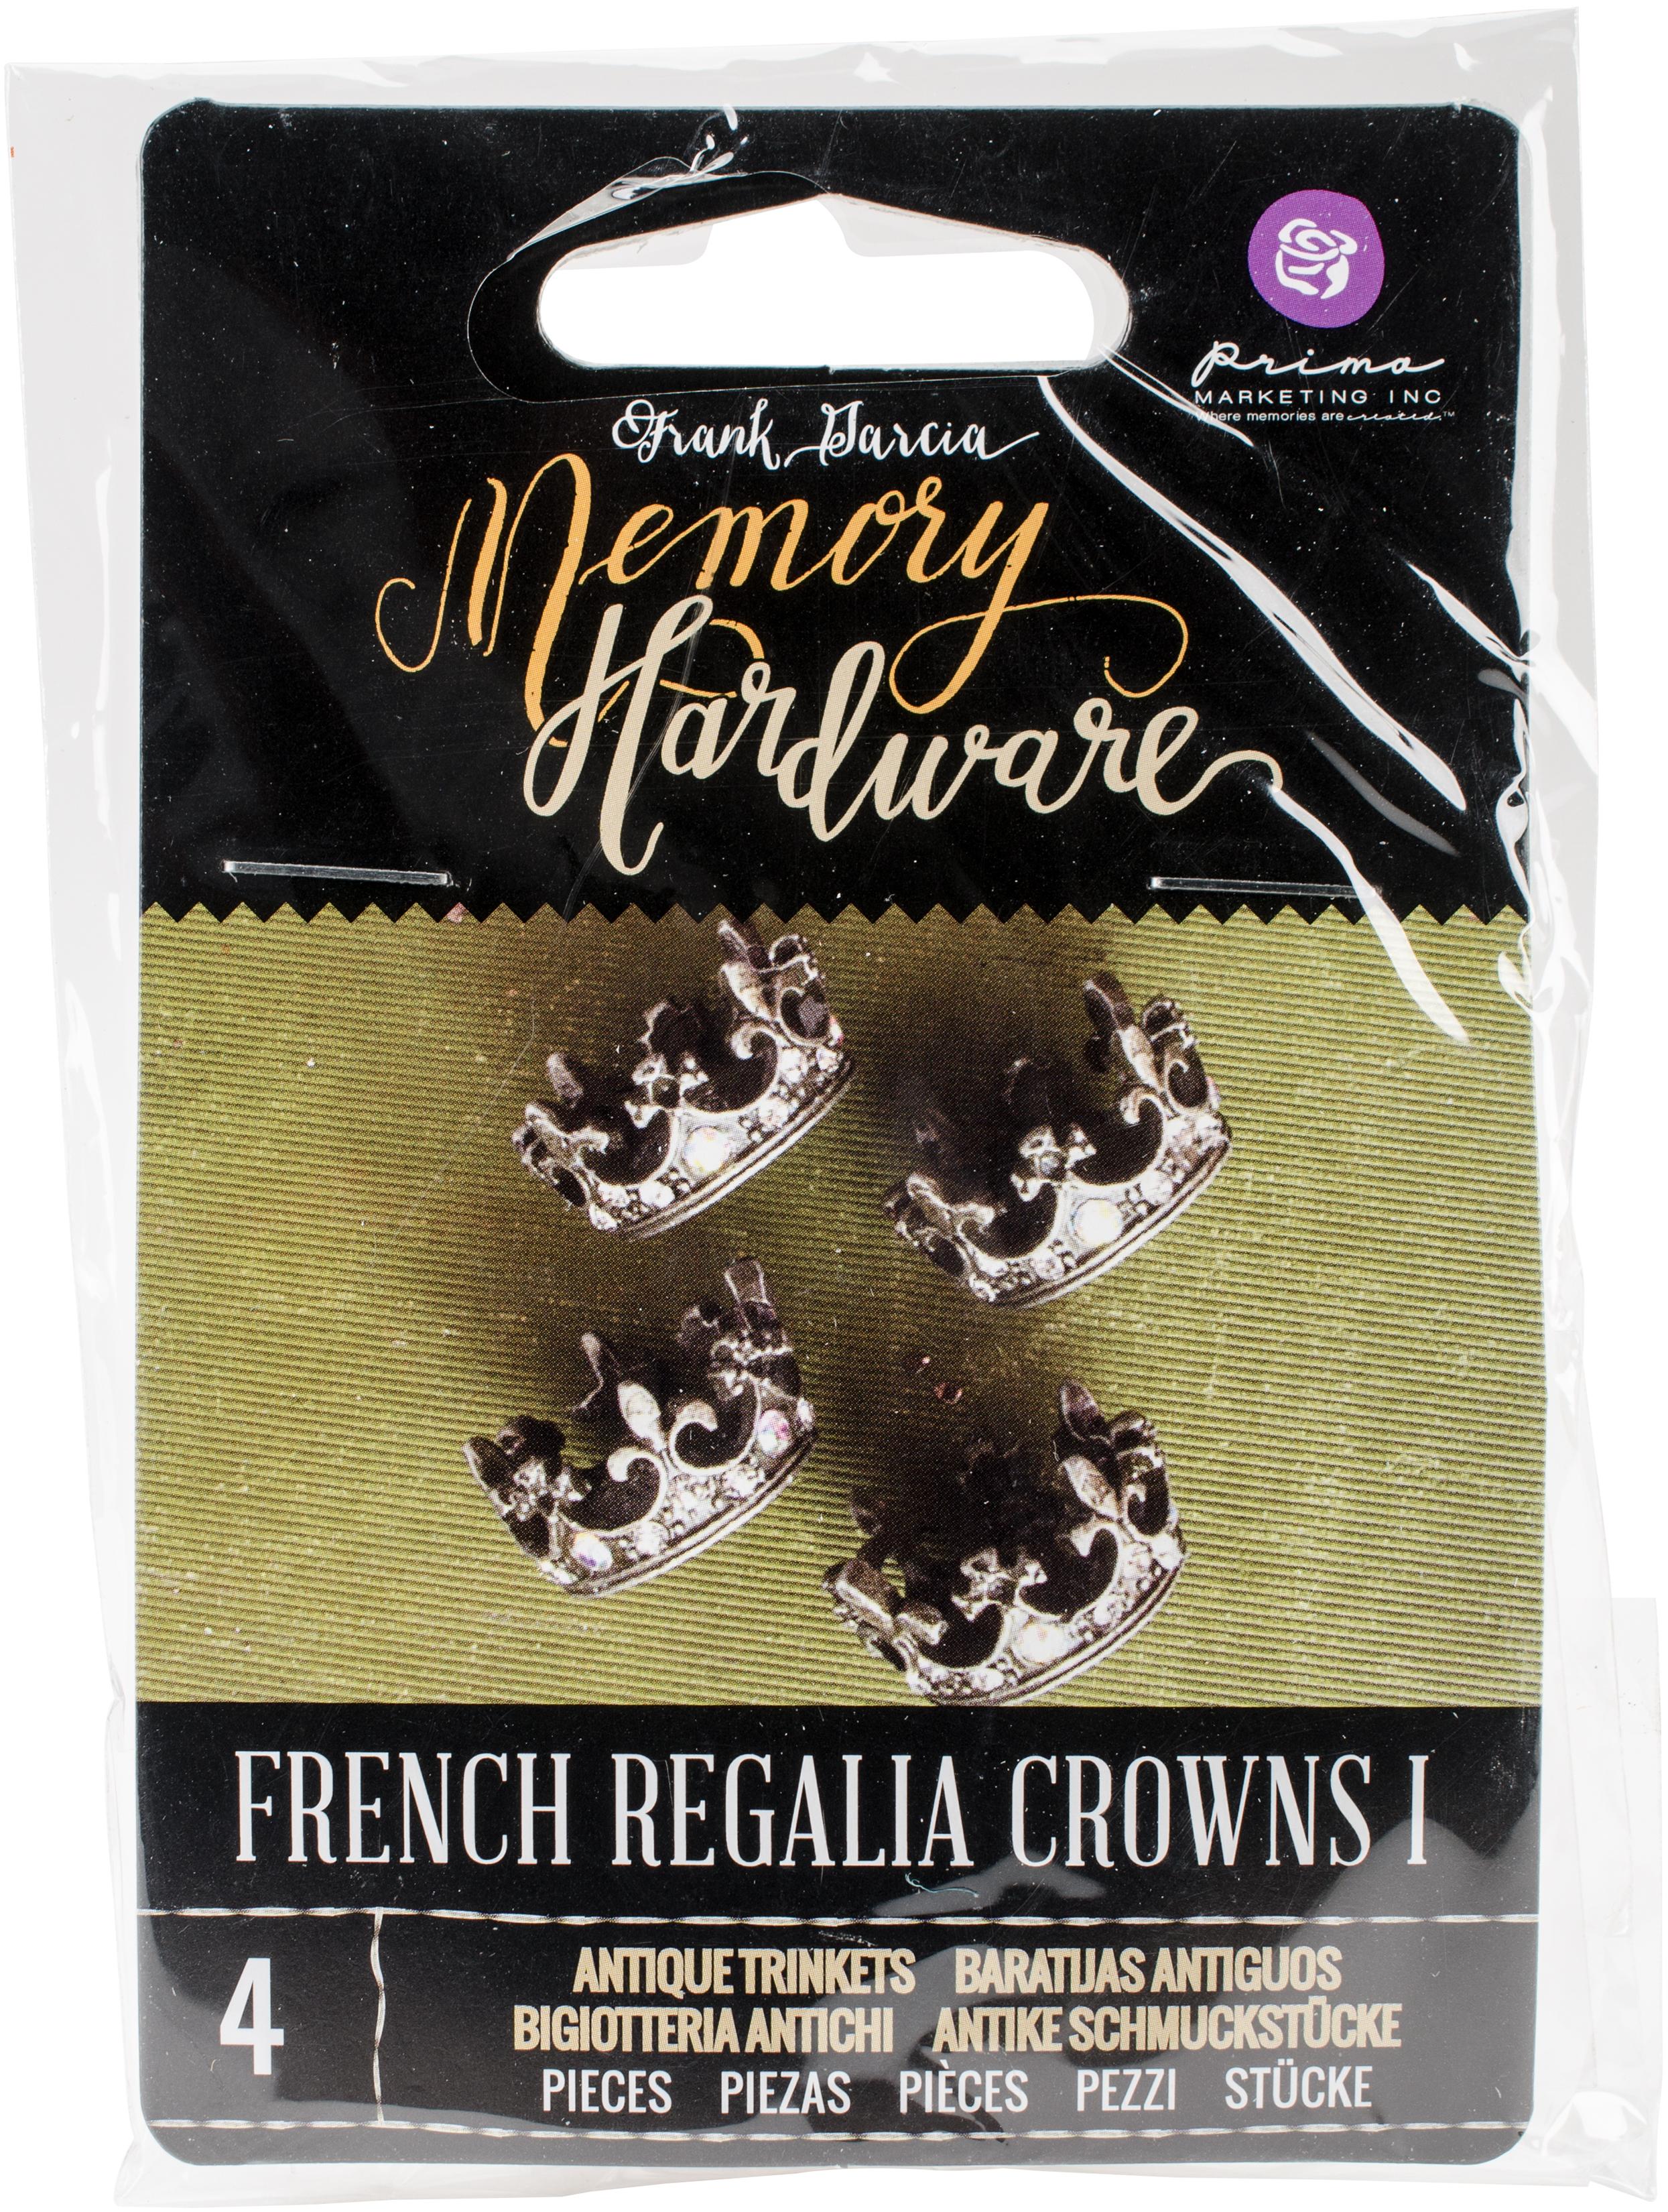 Memory Hardware Crowns I